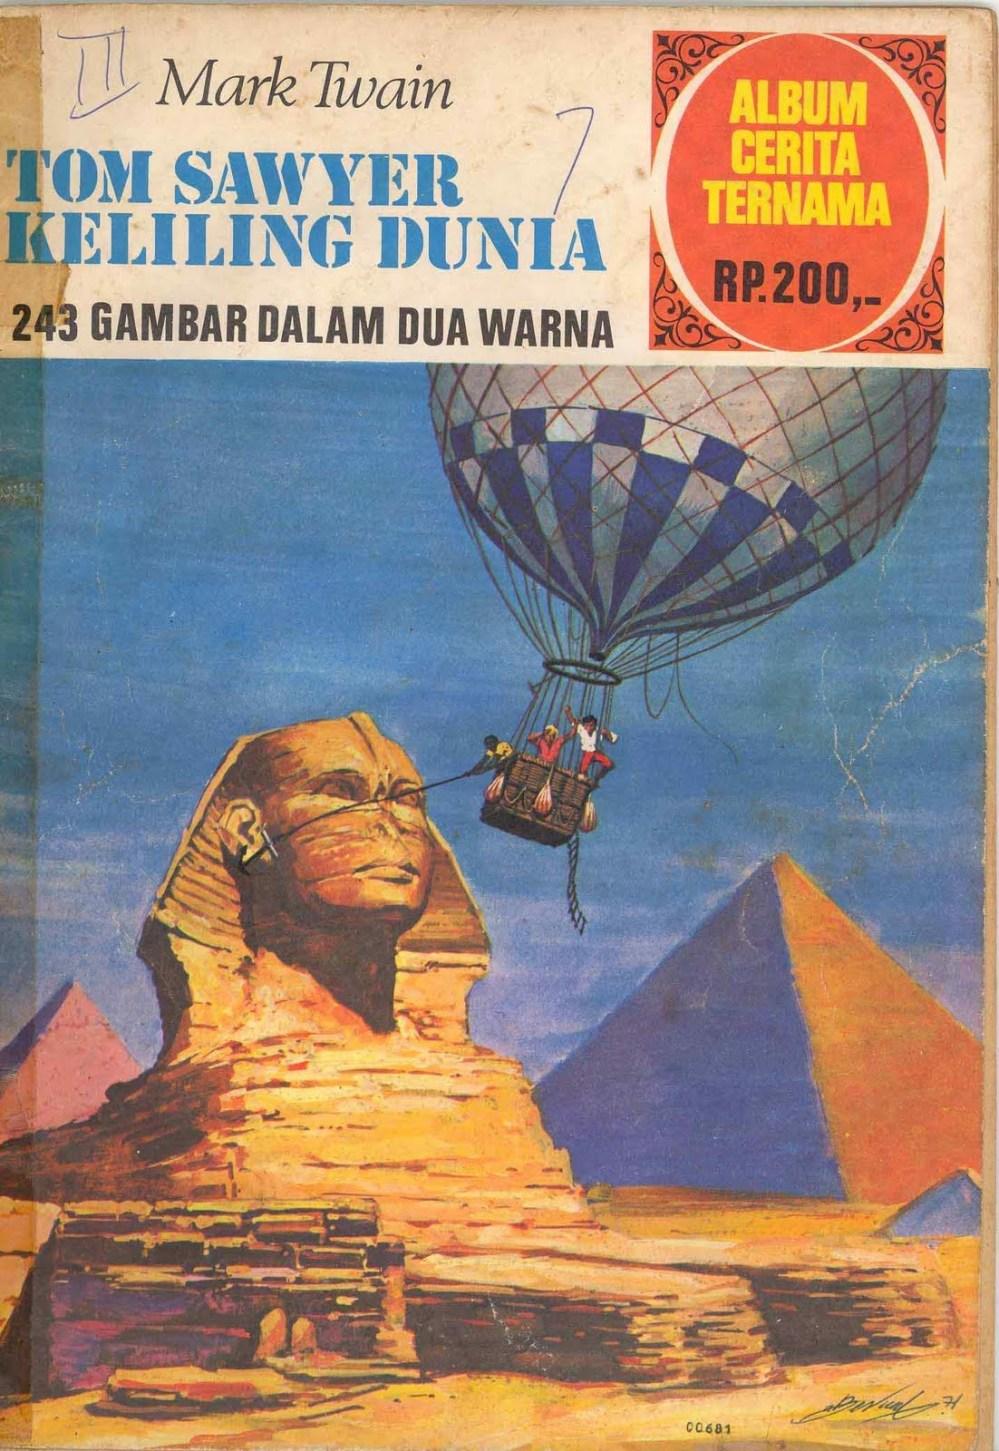 serial-komik-album-cerita-ternama-tom-sawyer-keliling-dunia-mark-twain